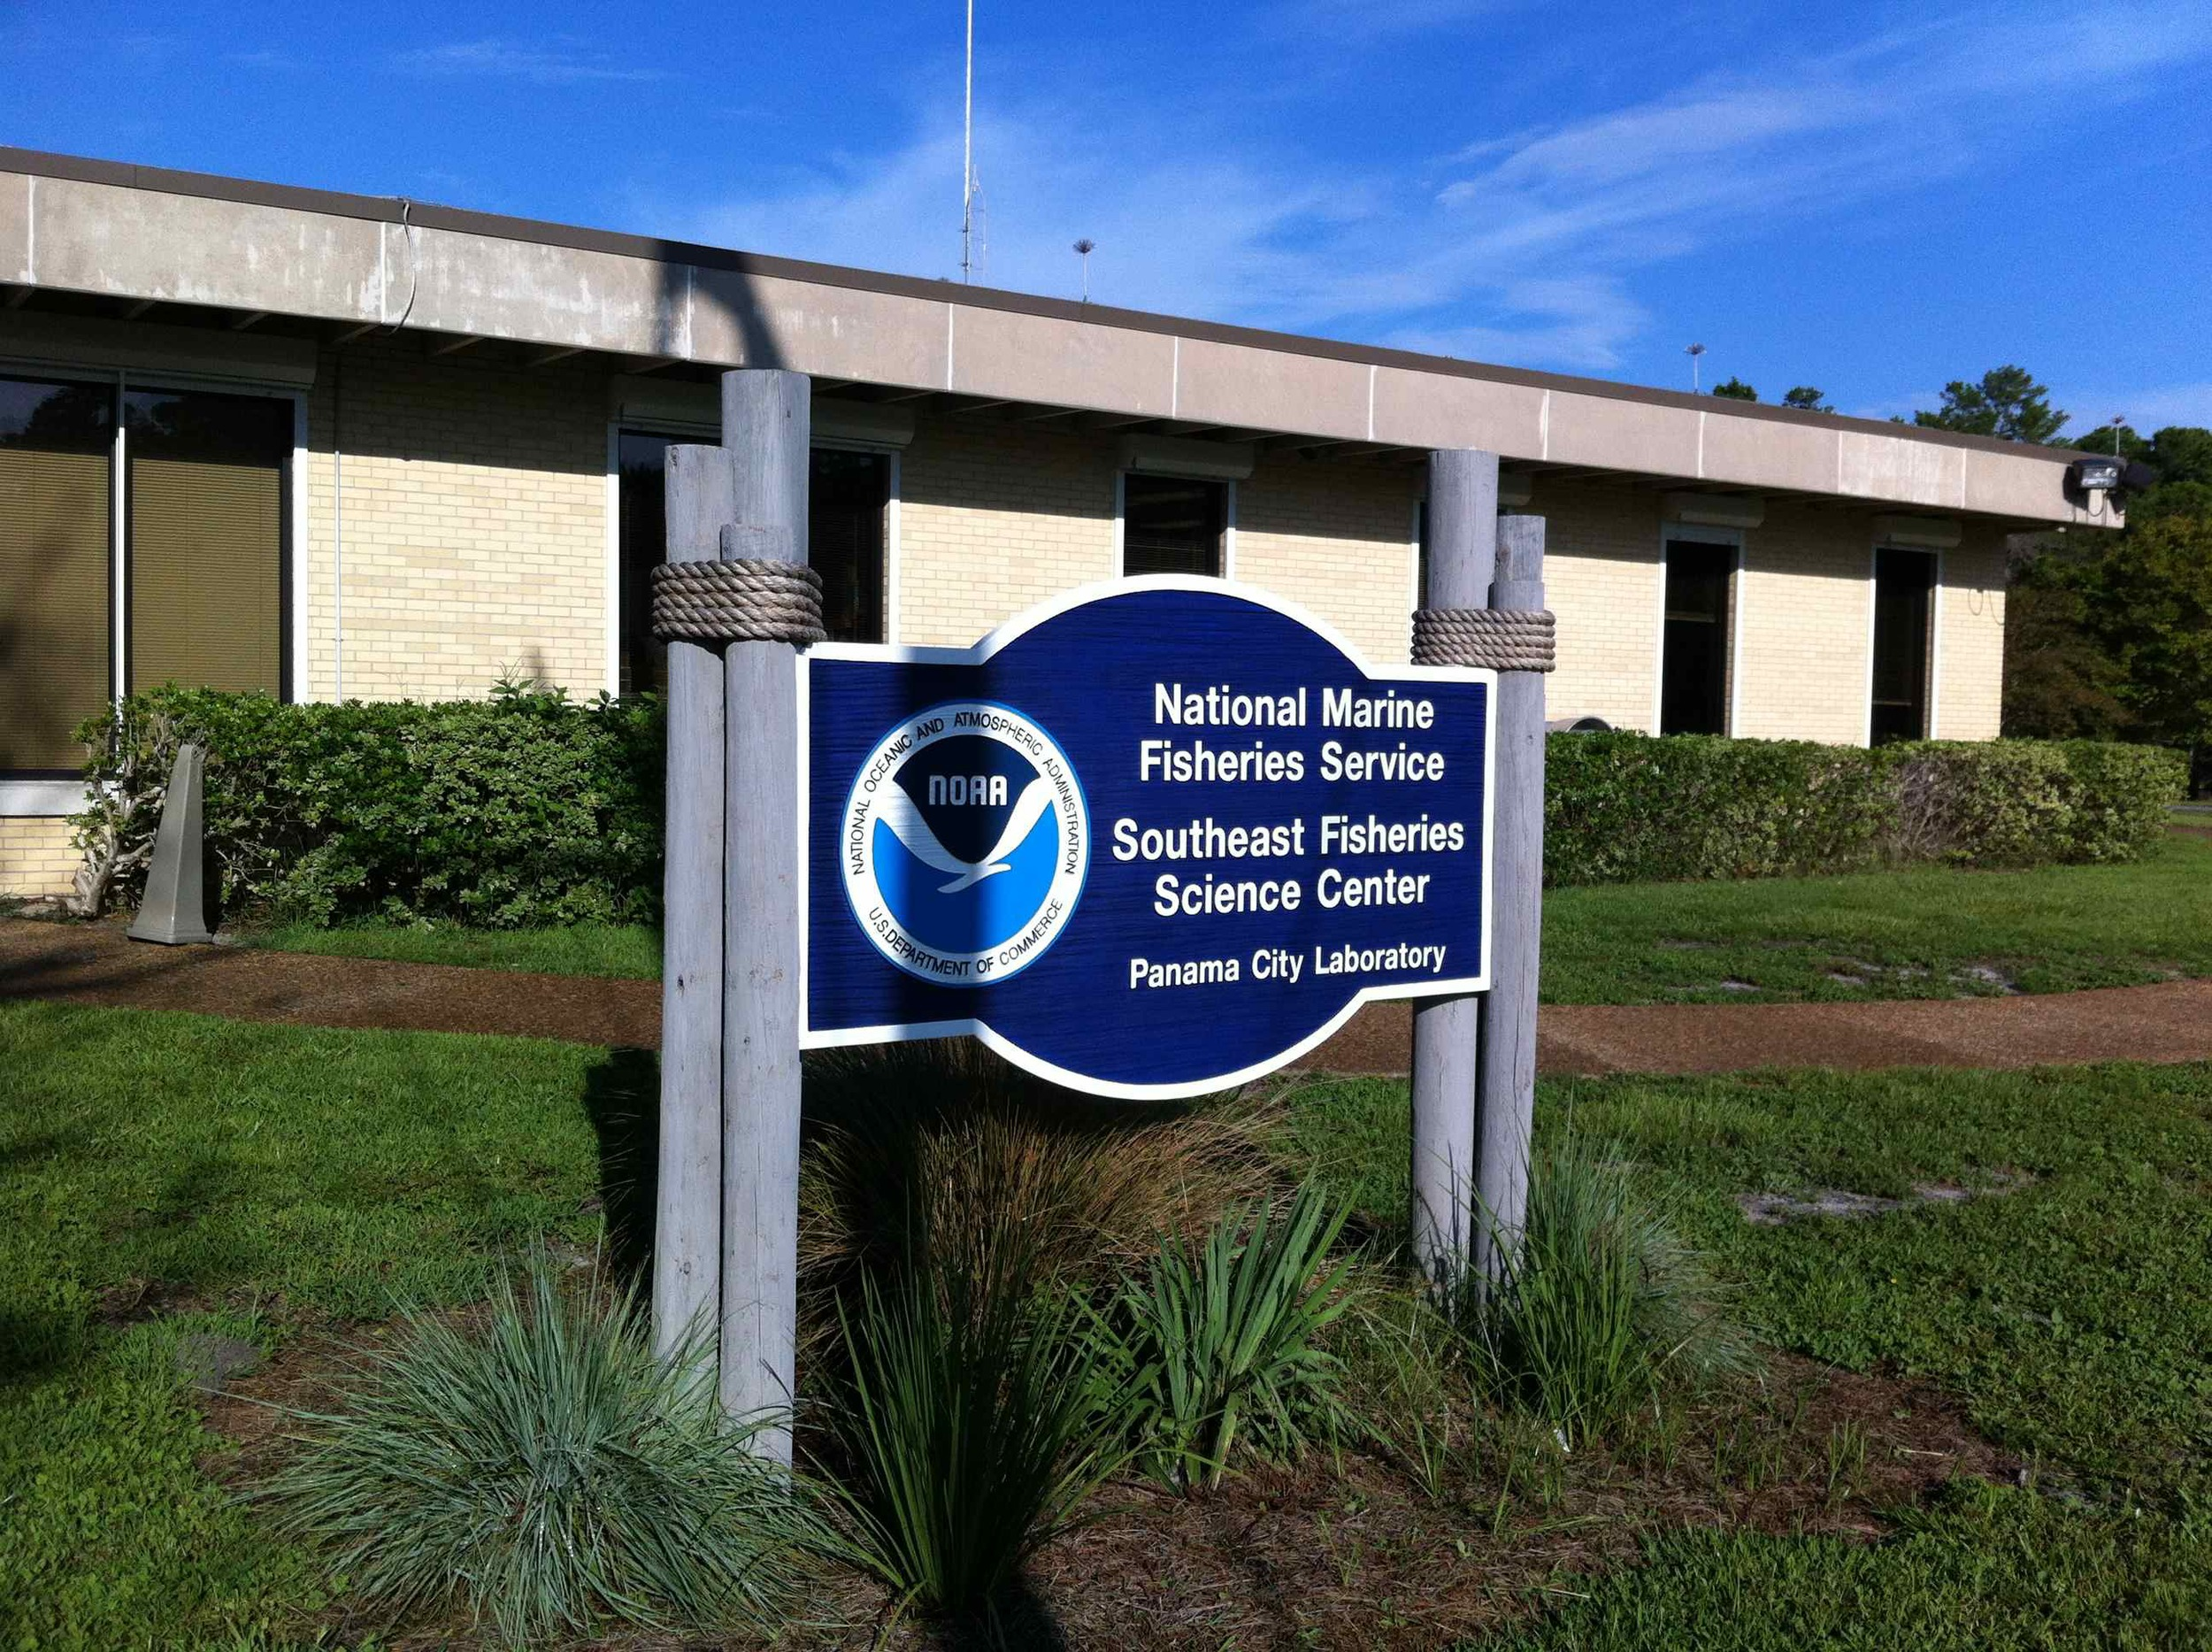 NOAA - National Marine Fisheries Service